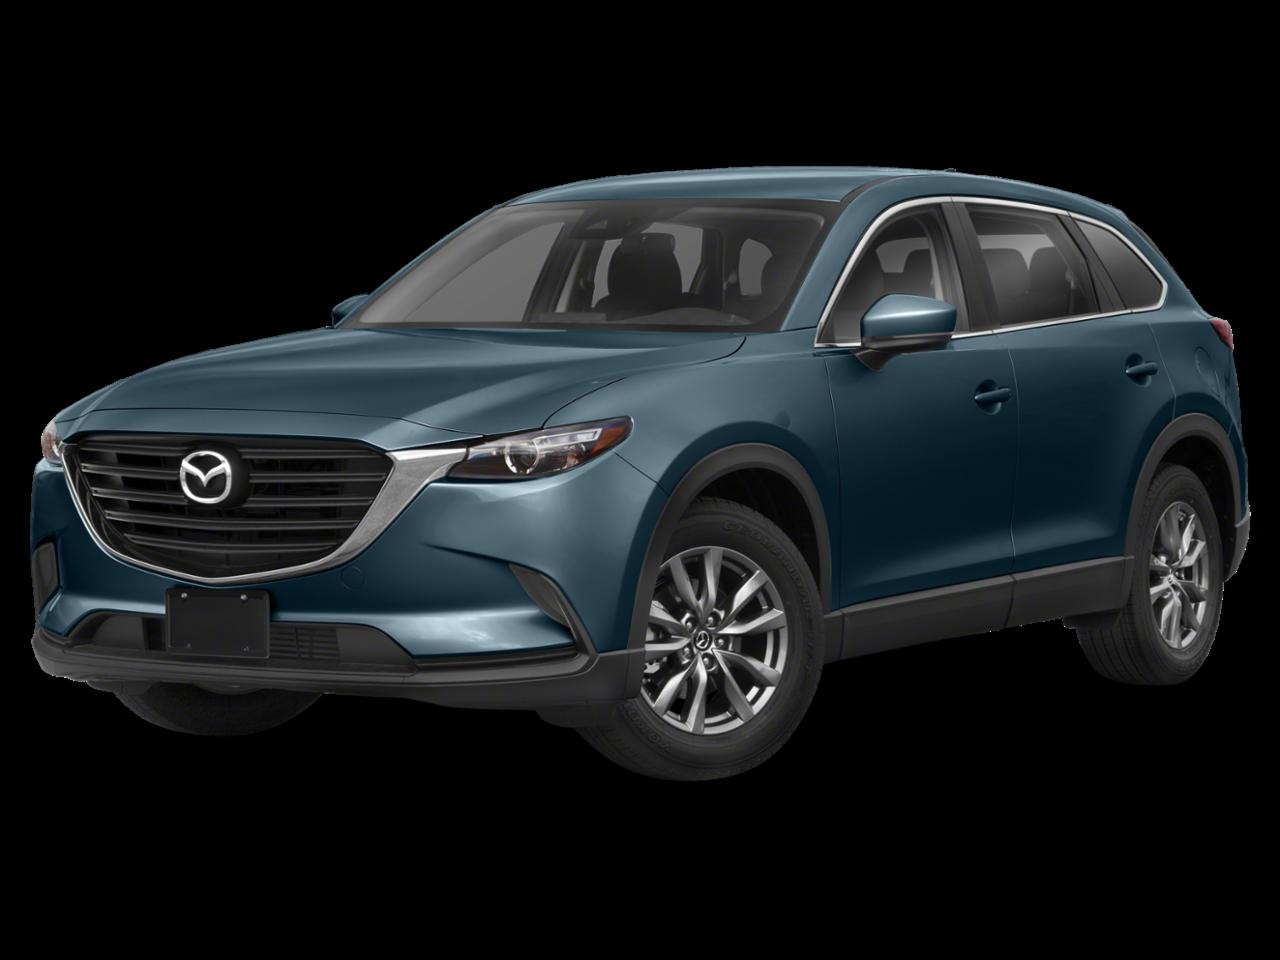 New 2020 Mazda CX-9 Sport